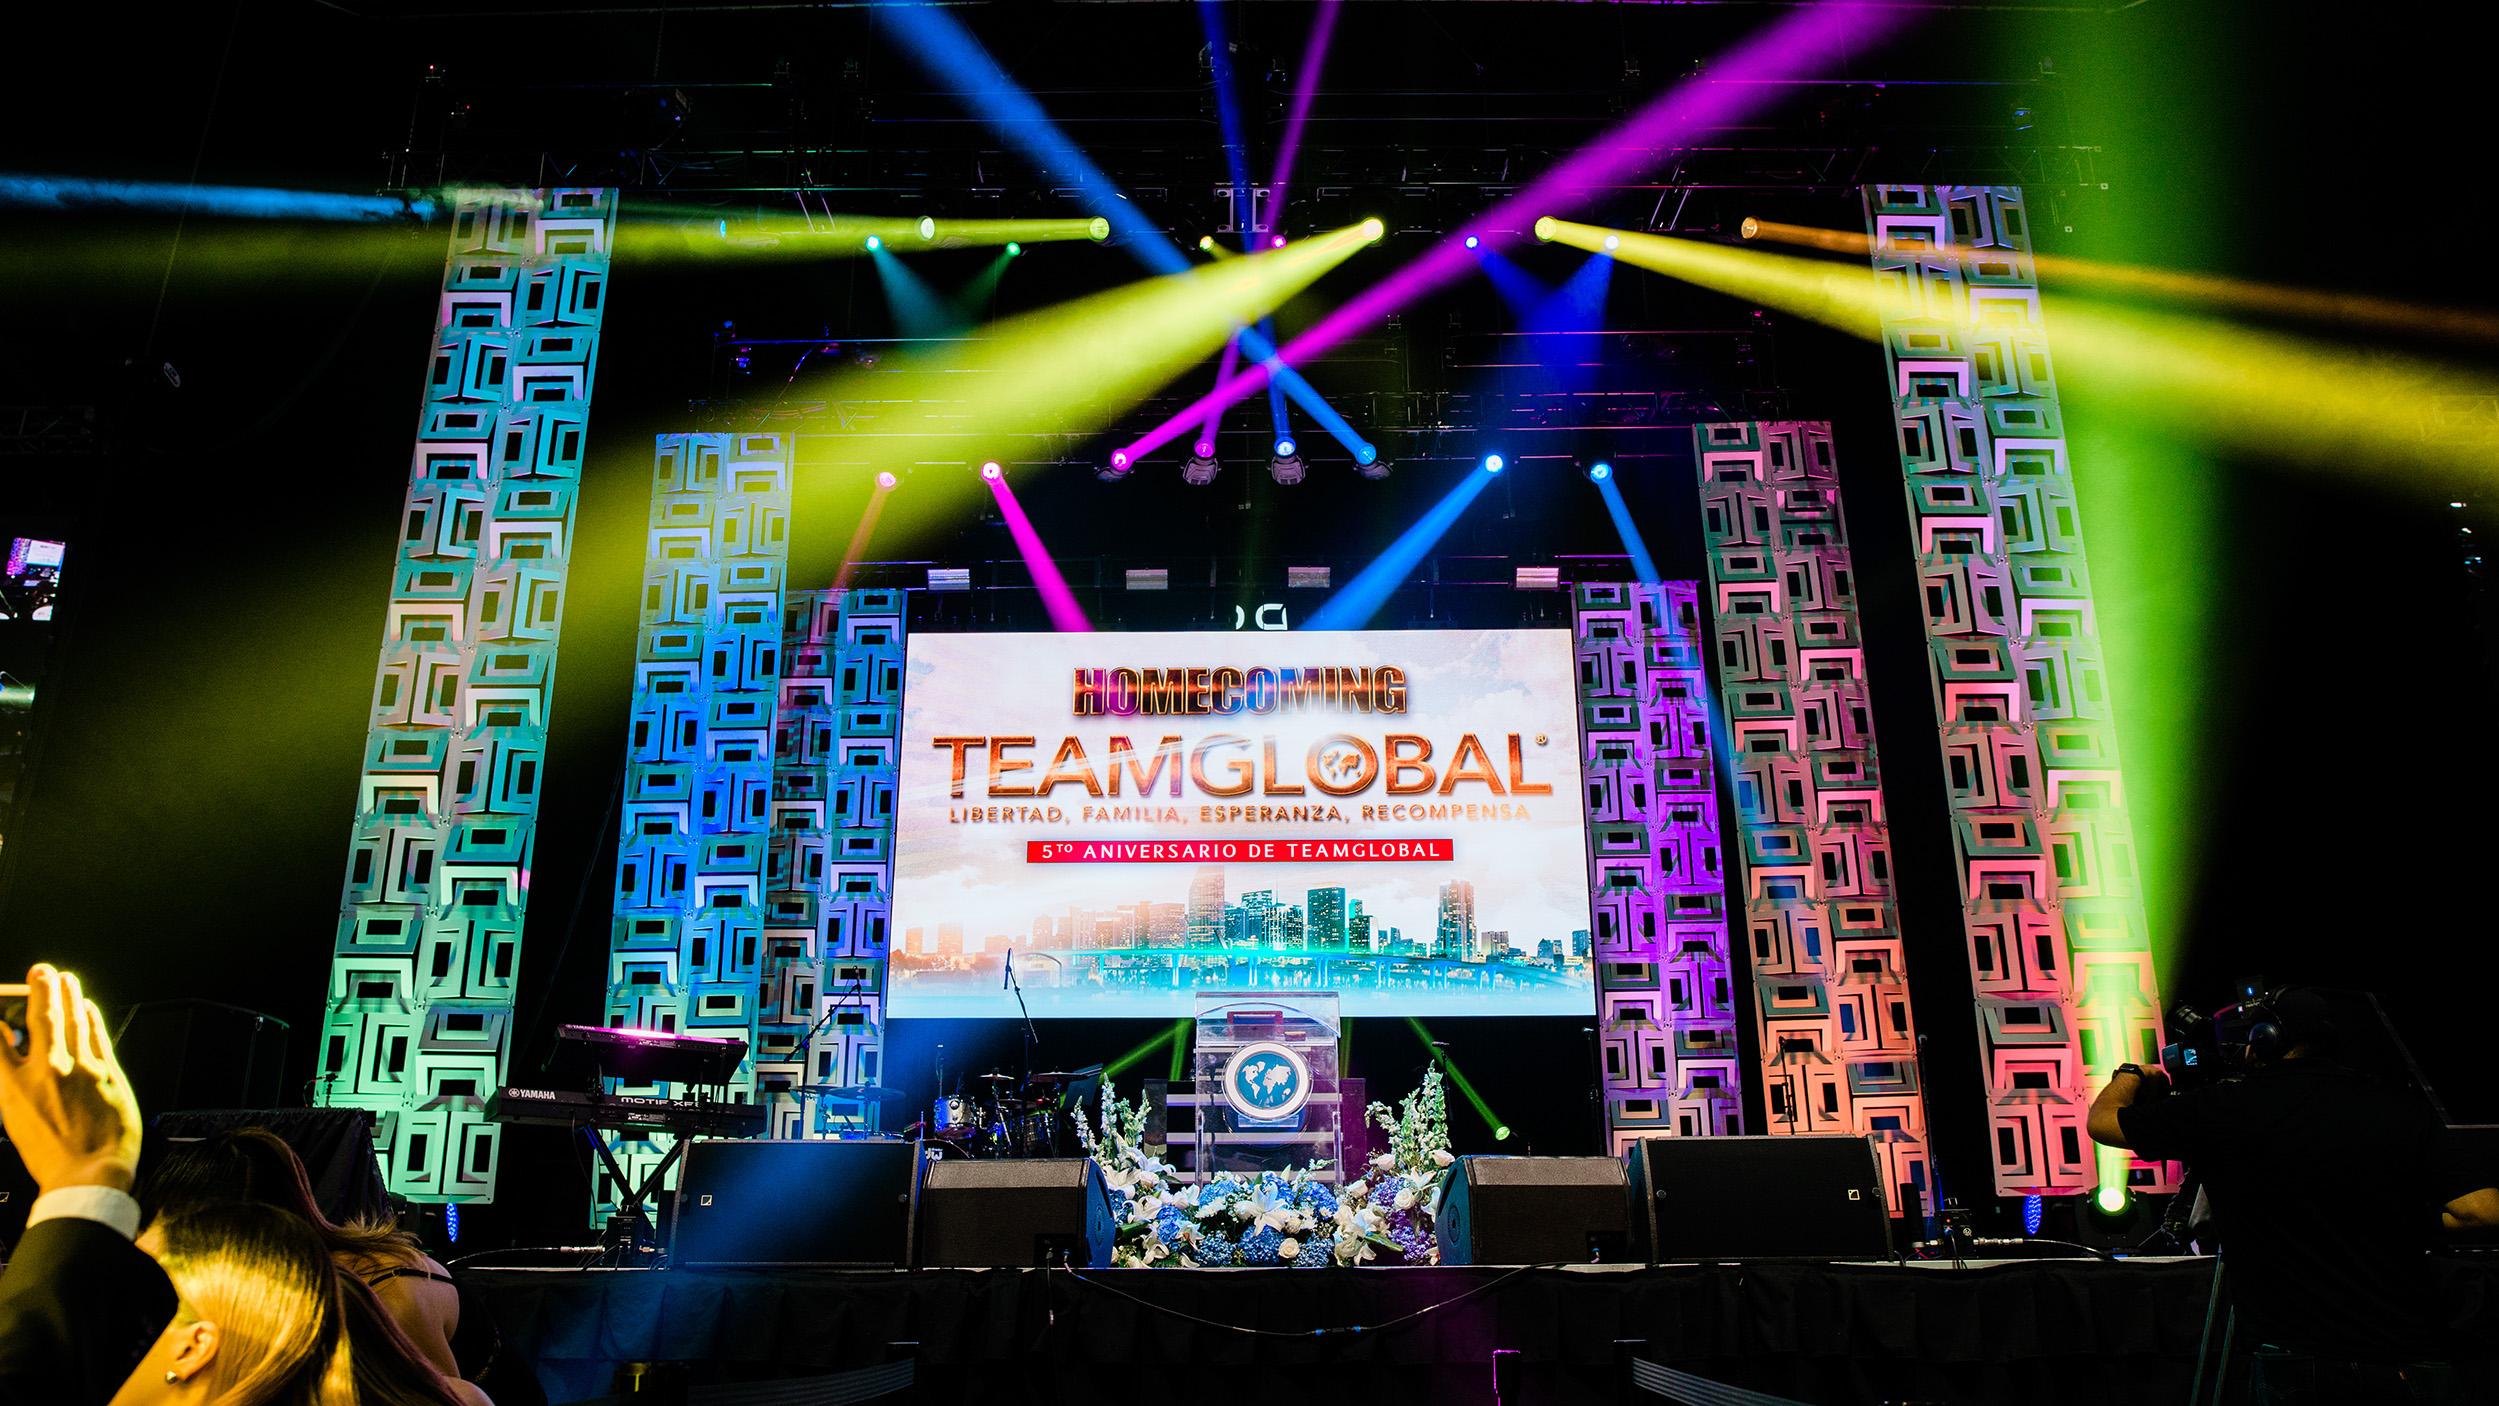 Amway TeamGlobal Anniversary